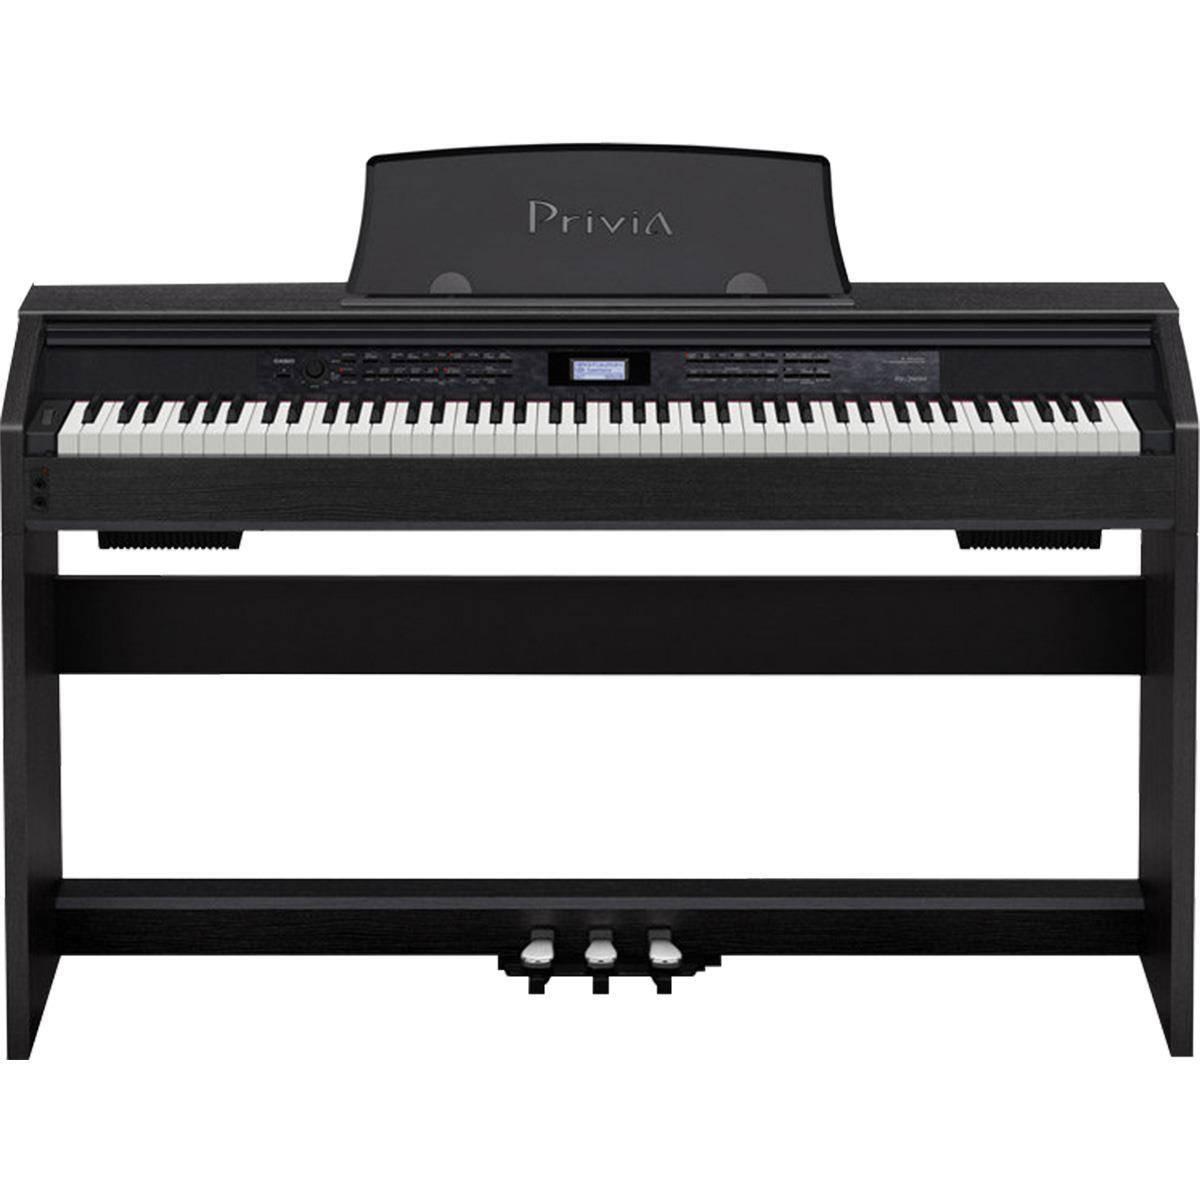 PIANO CASIO DIGITAL       PX-780MBK